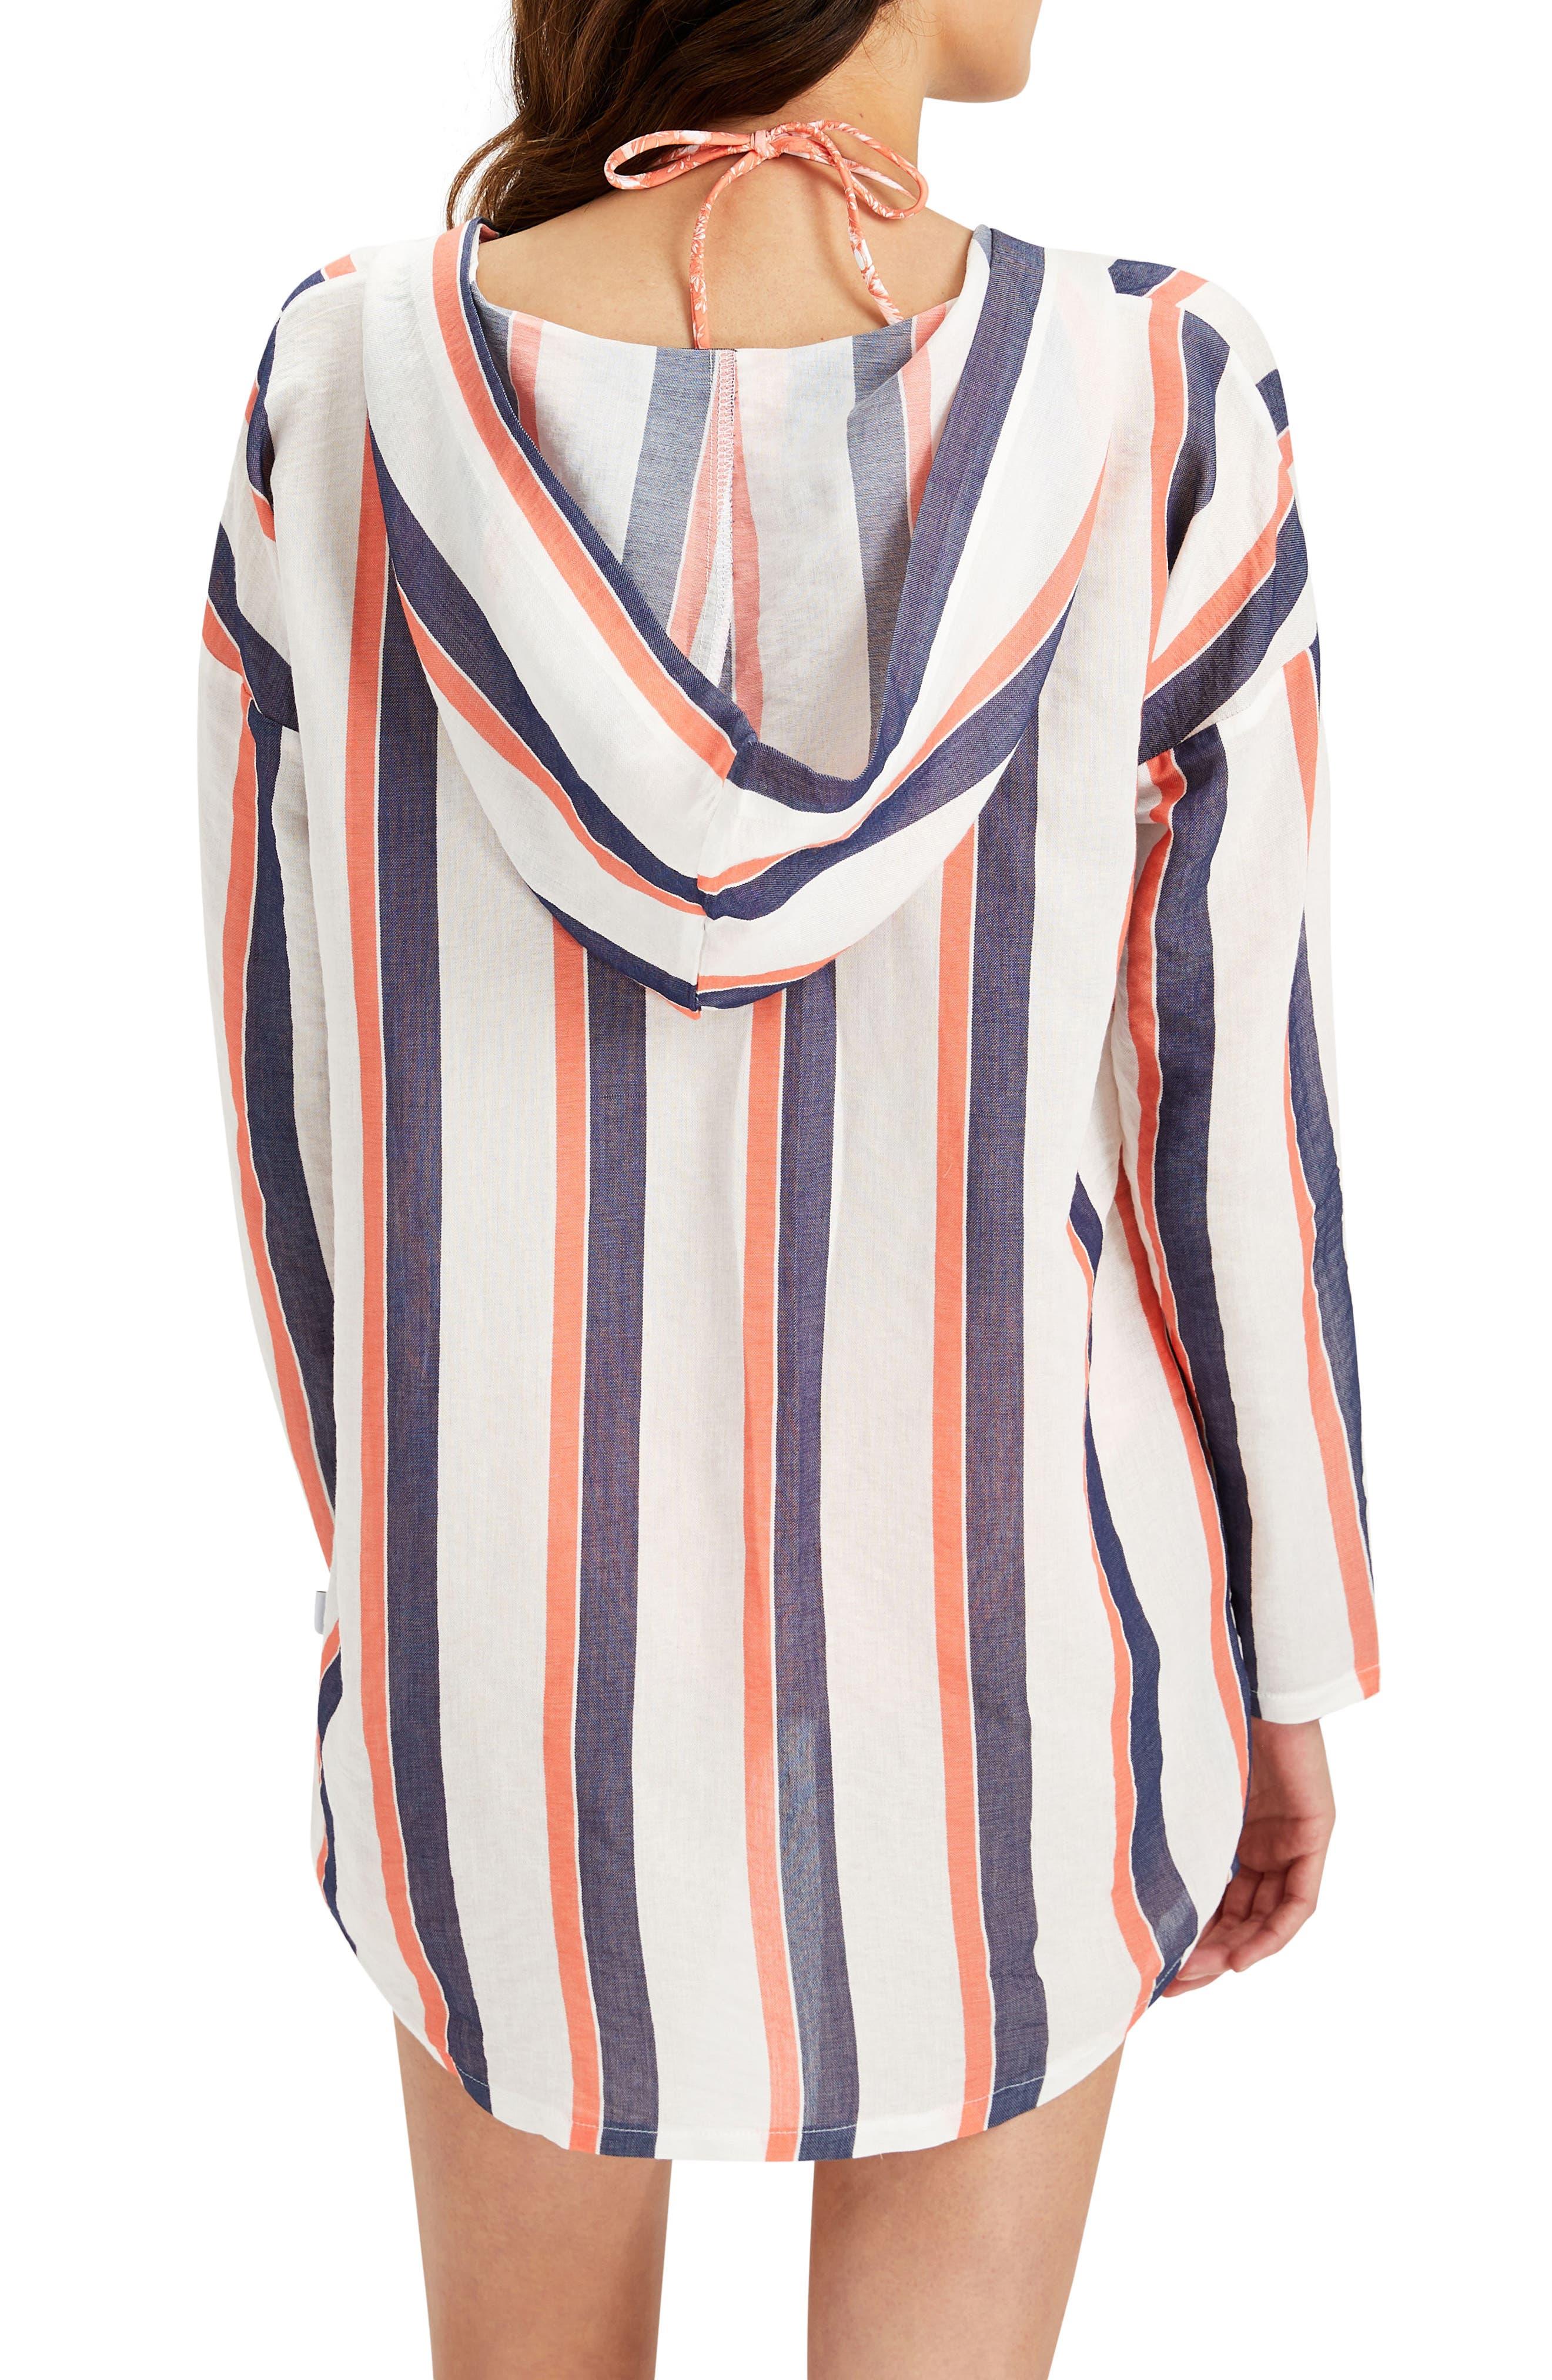 Sophia Stripe Hooded Cover-Up Tunic,                             Alternate thumbnail 3, color,                             822